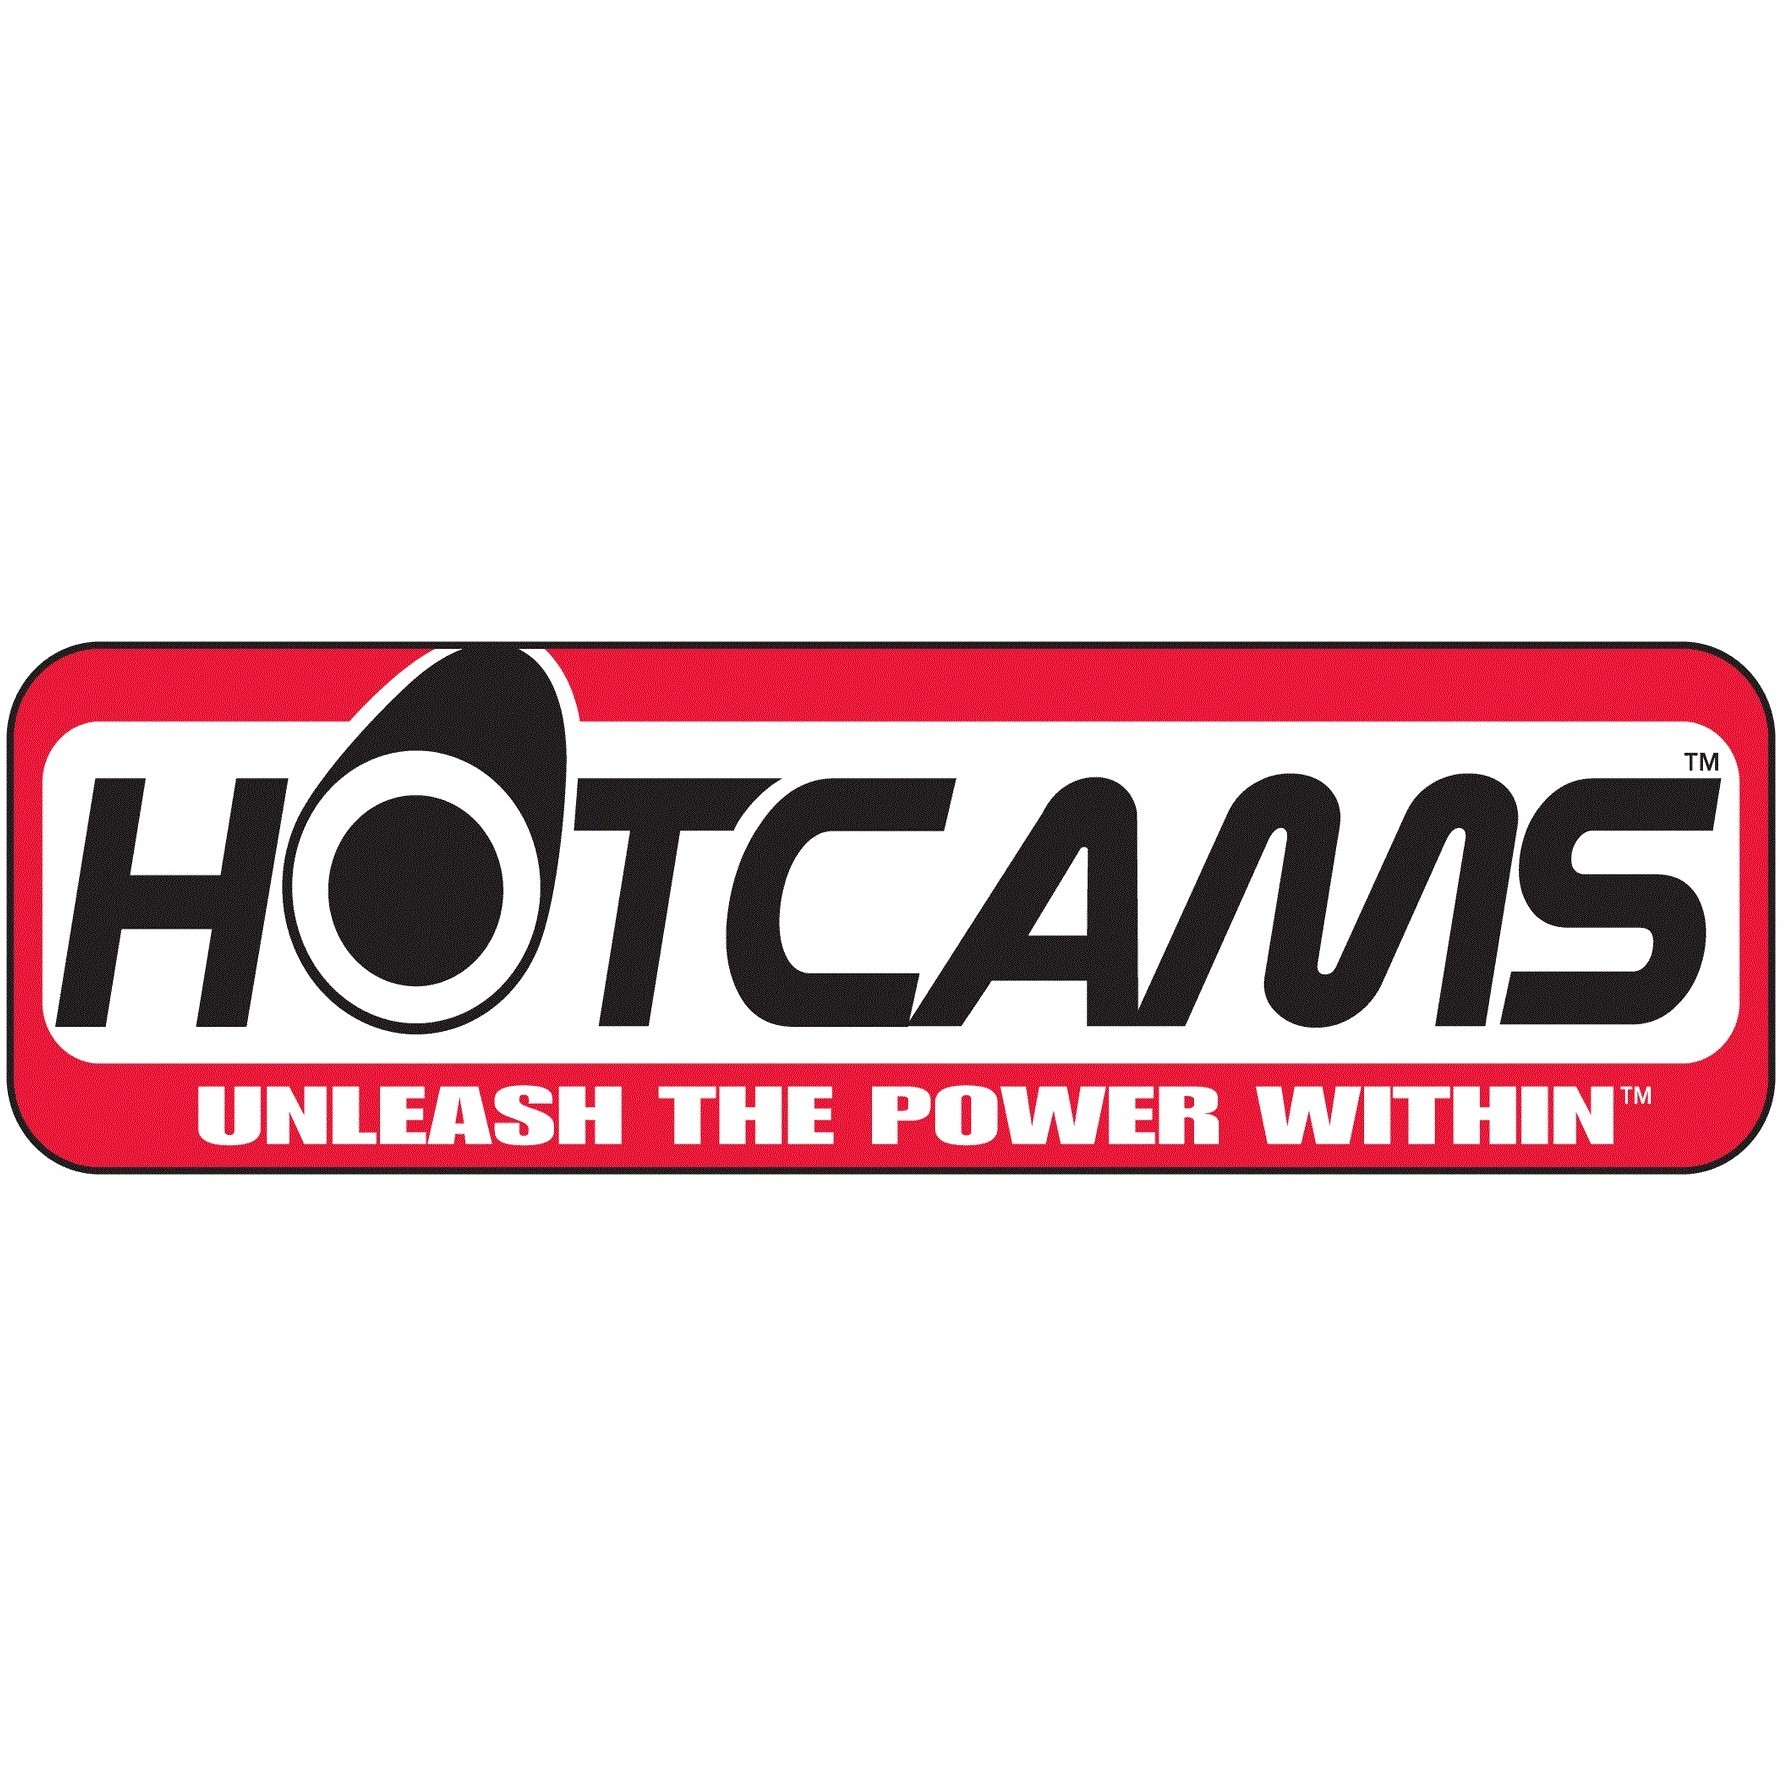 HOT CAMS